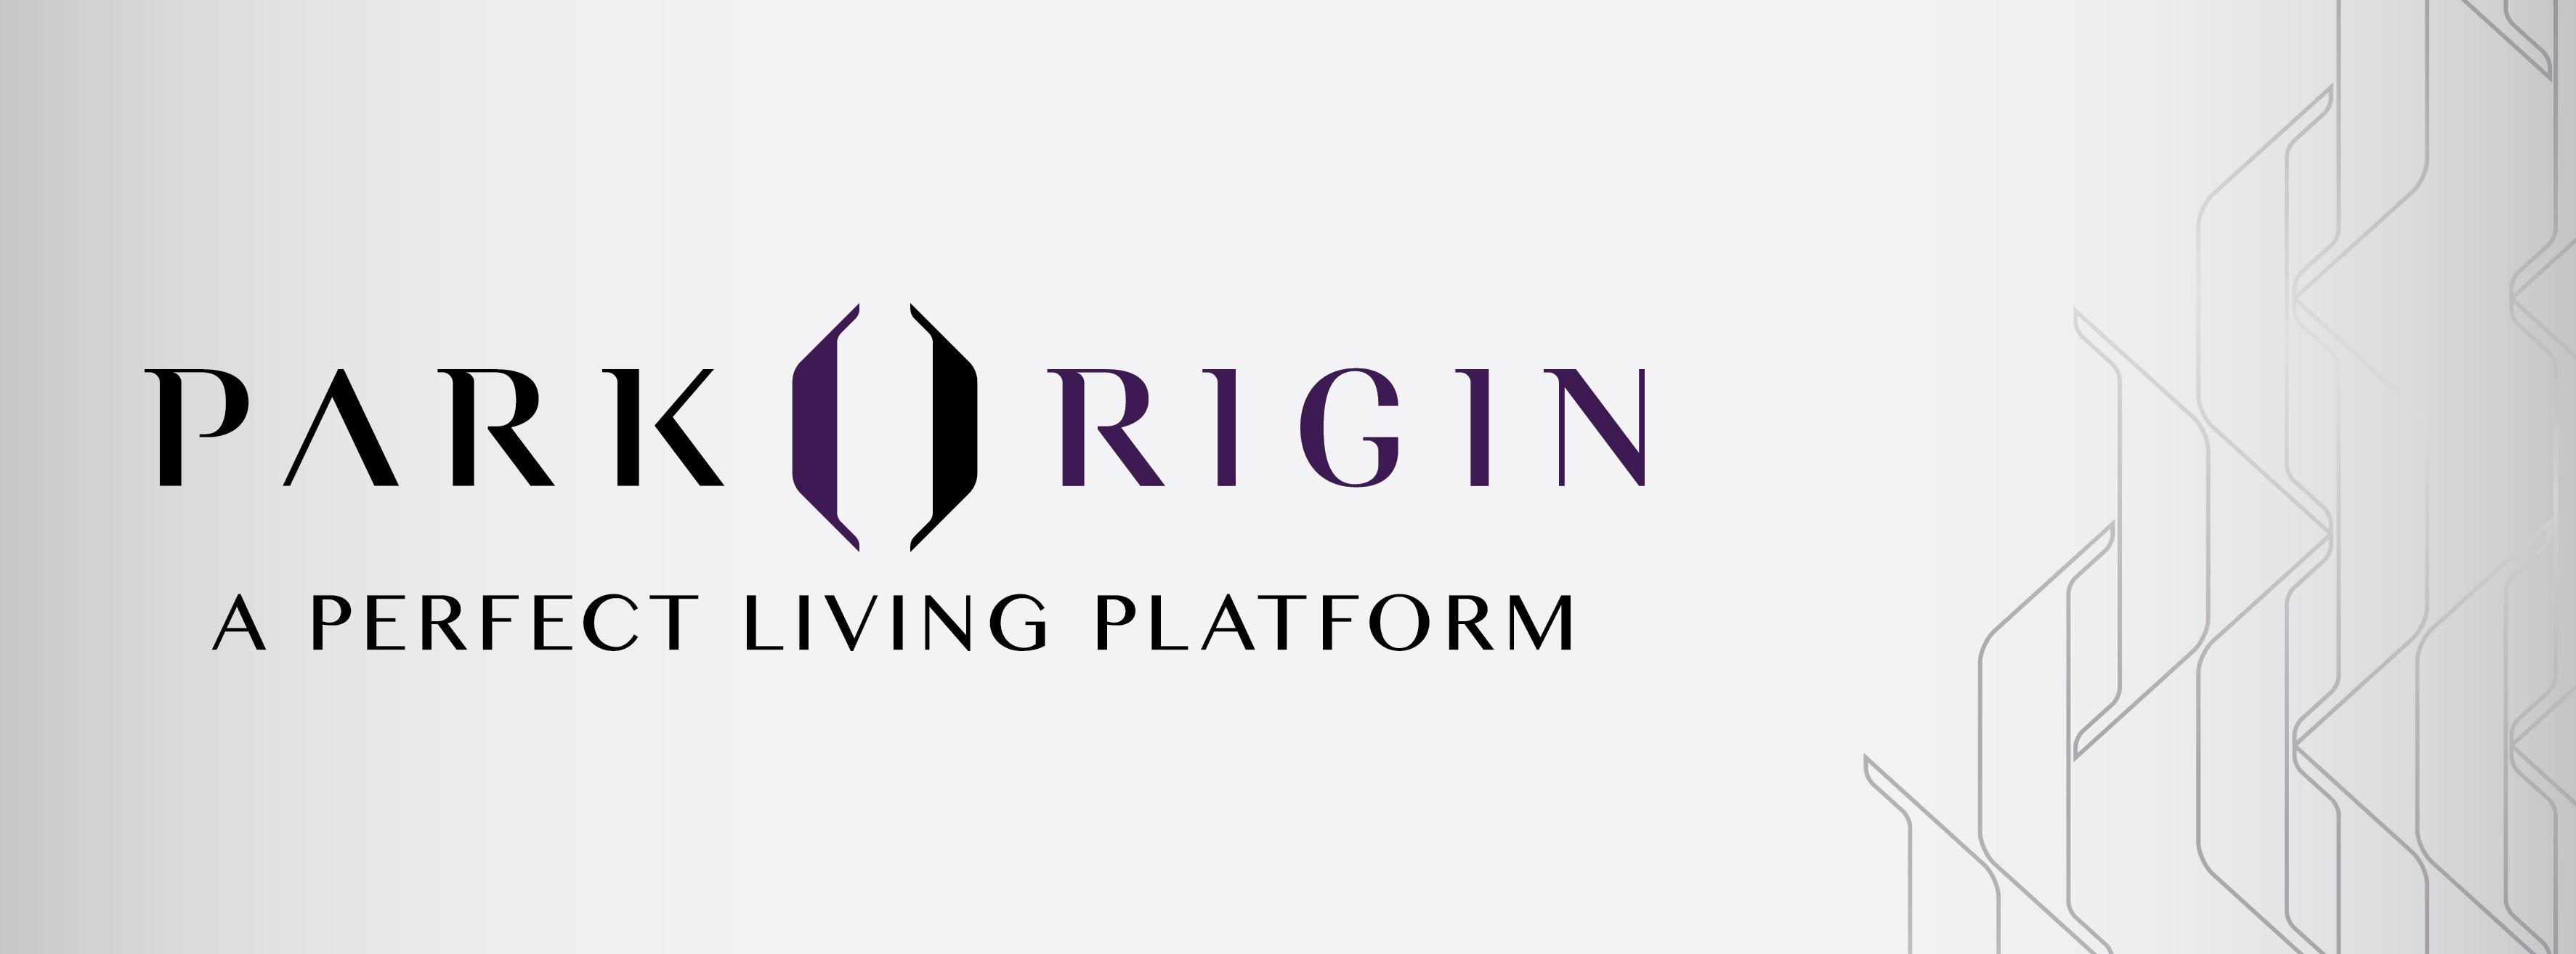 """Park Origin"" - A Perfect Living Platform แบรนด์หรู flagship ใหม่จากออริจิ้น"